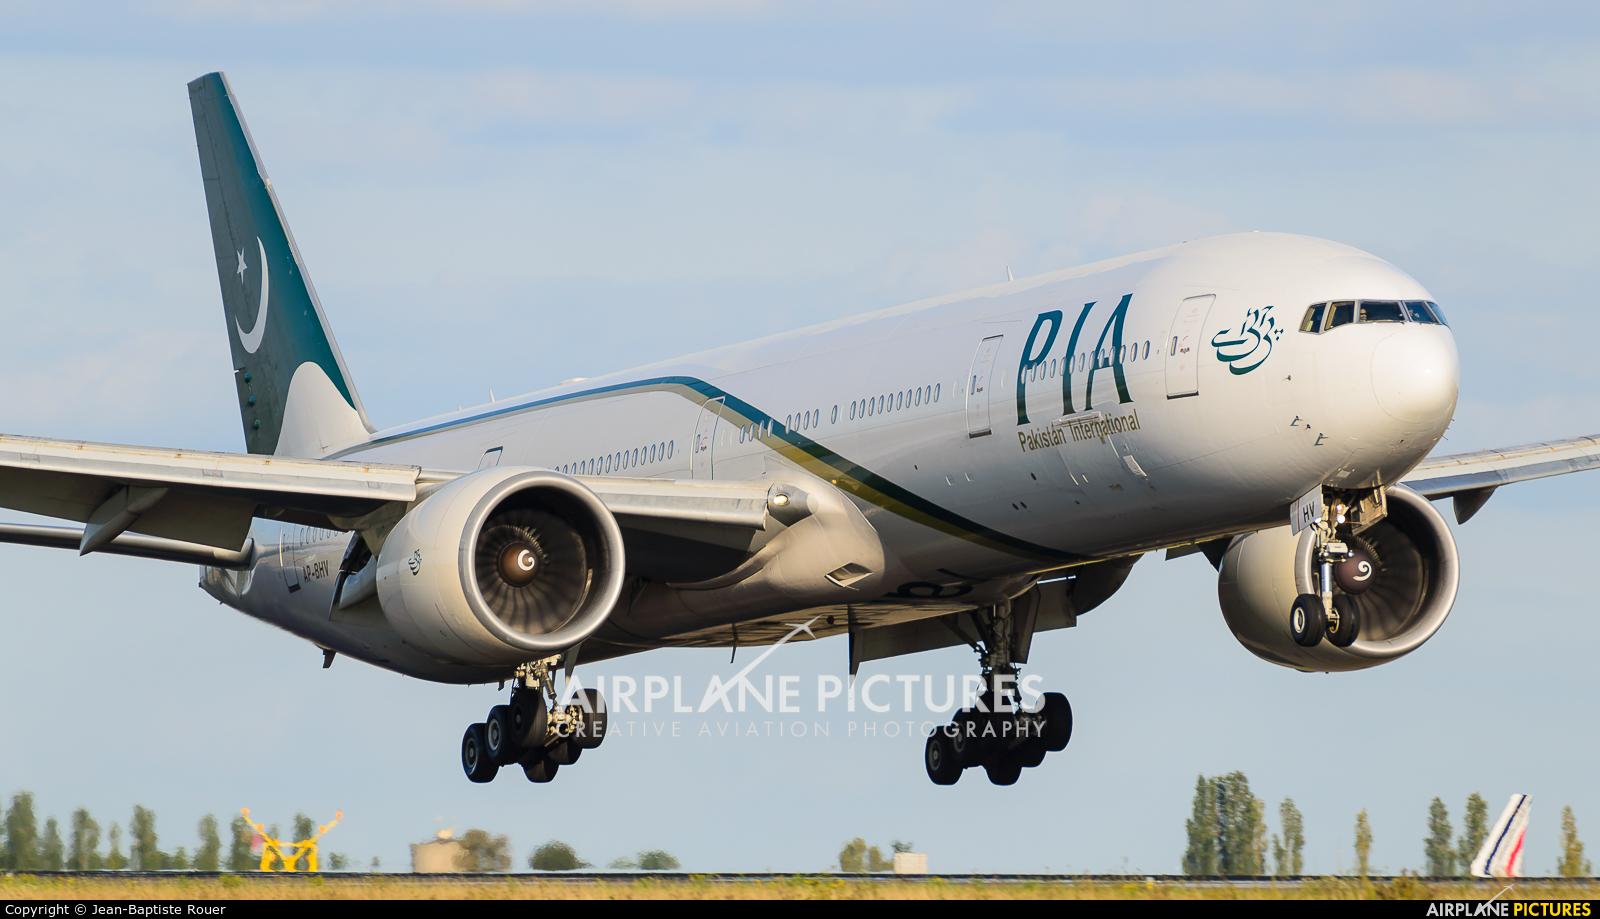 PIA - Pakistan International Airlines AP-BHV aircraft at Paris - Charles de Gaulle